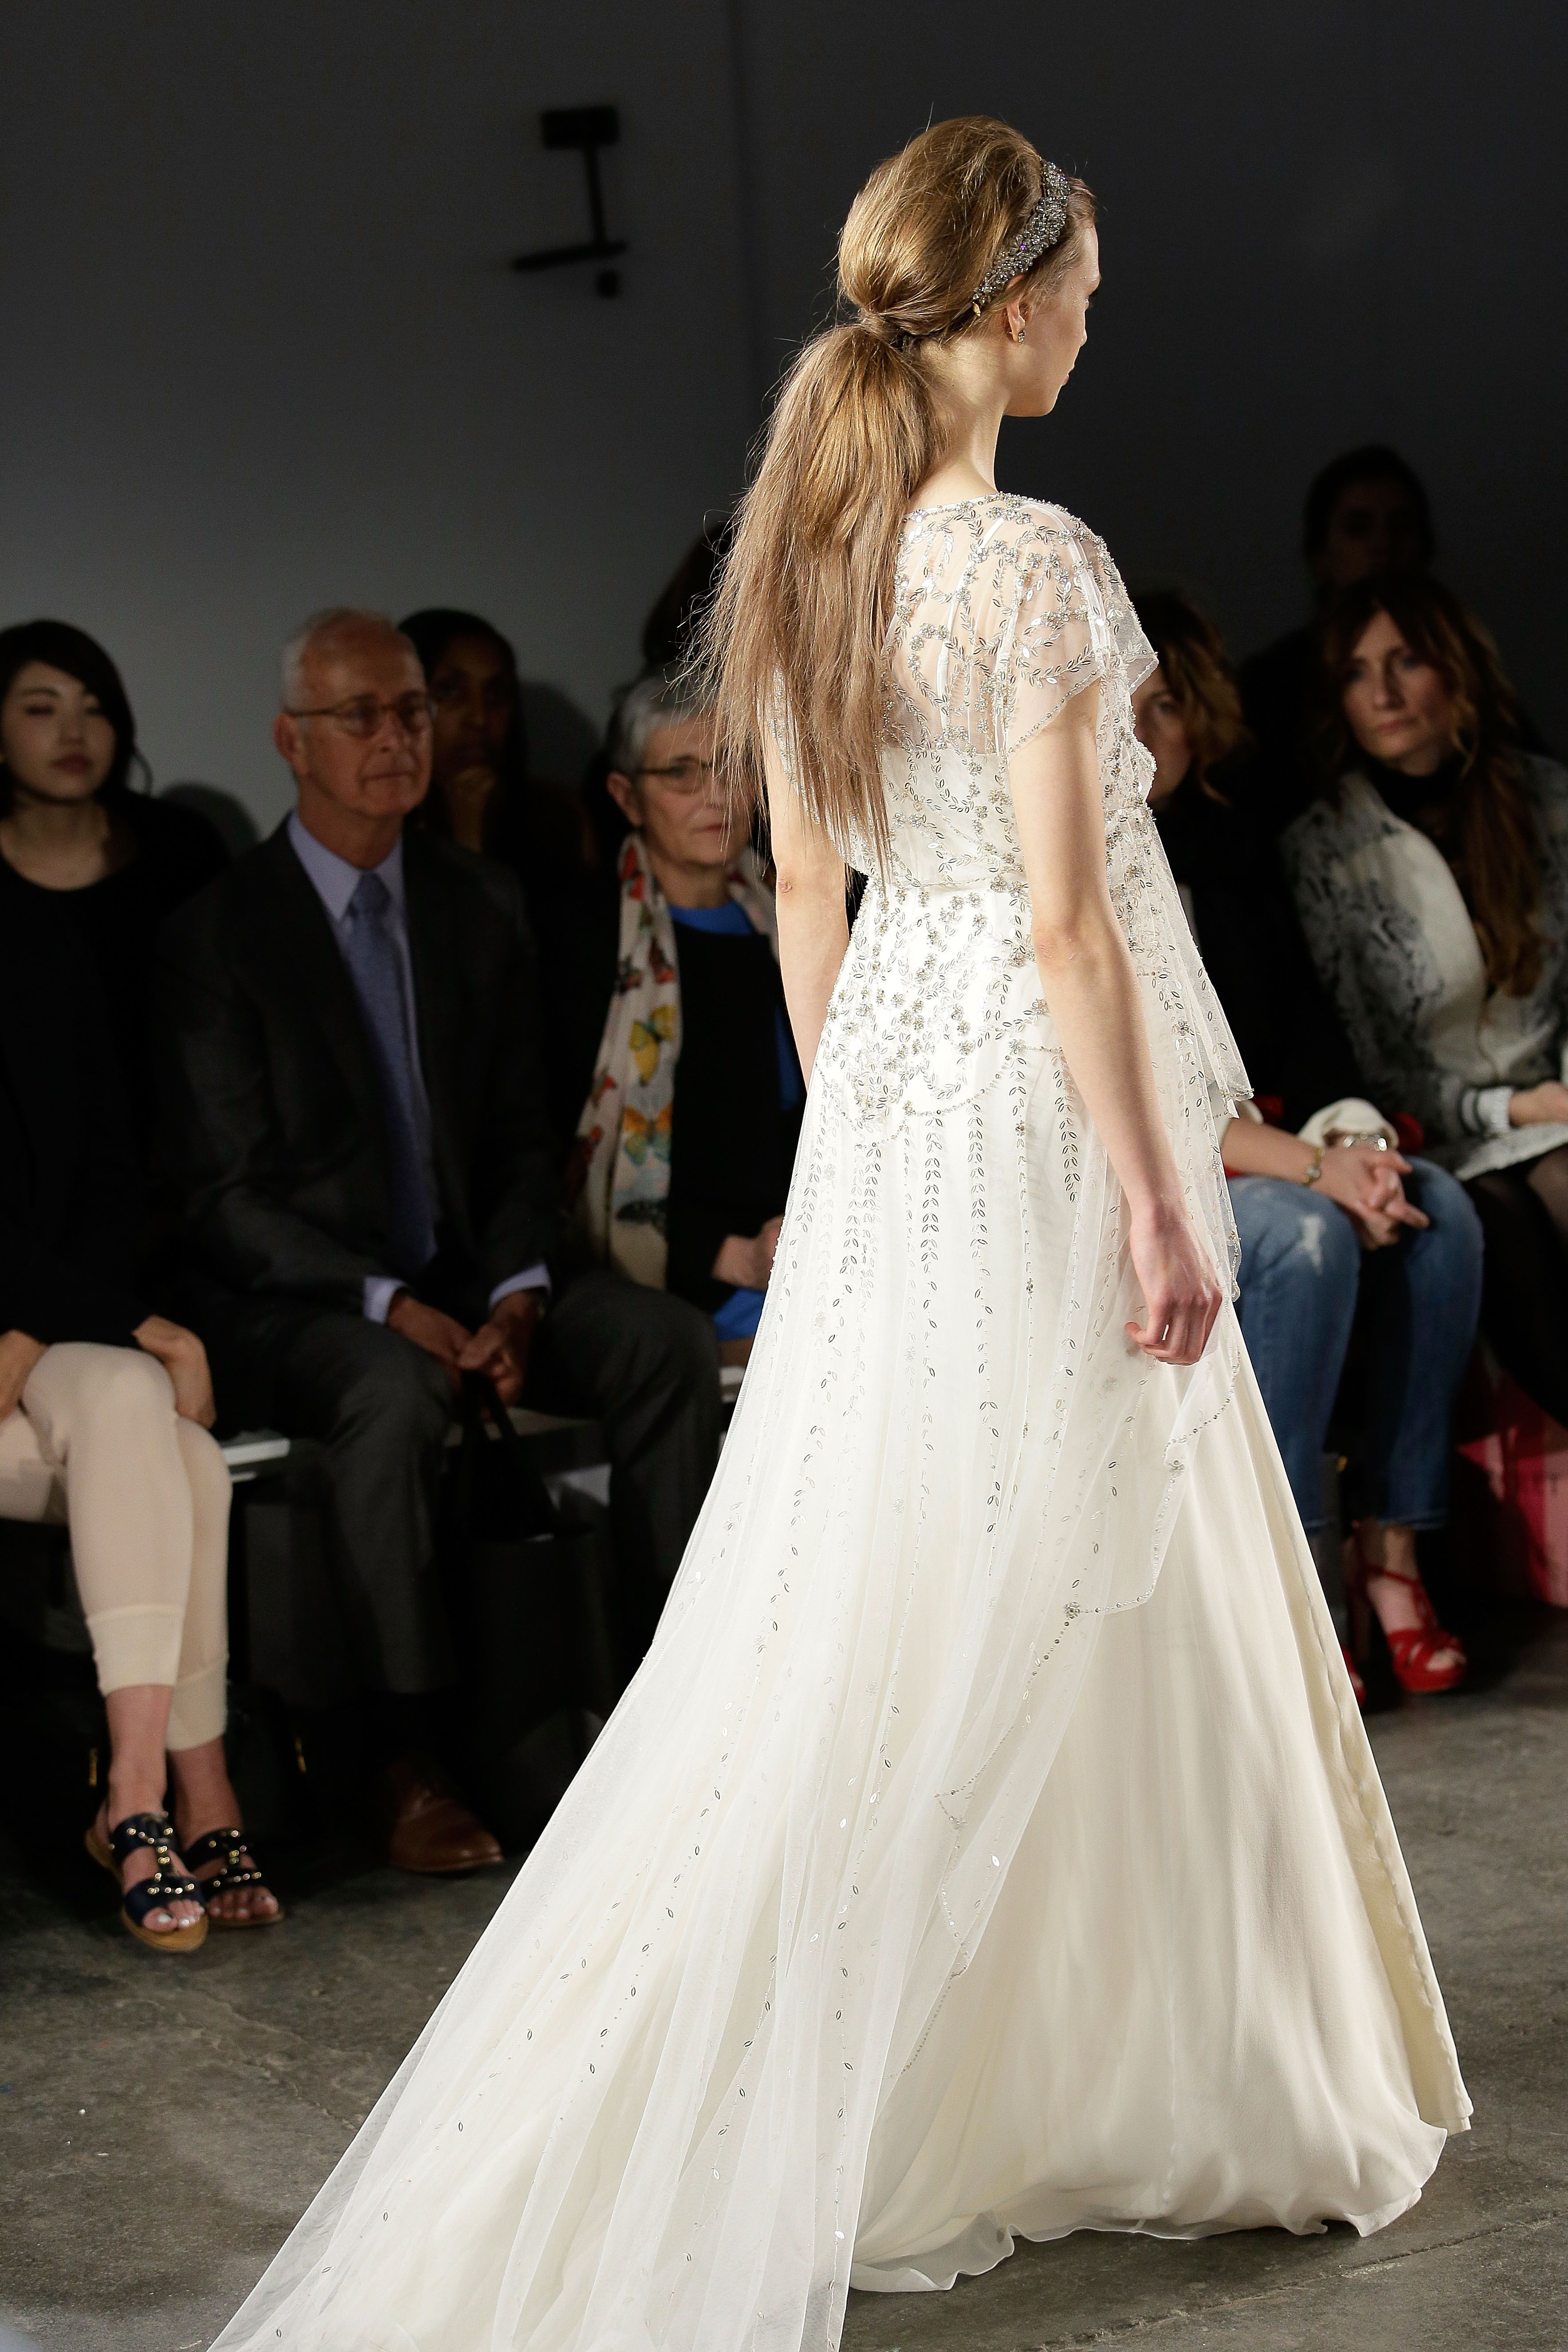 Jenny Packham 2015 Bridal Collection - Hatty Wedding Dress (Back)